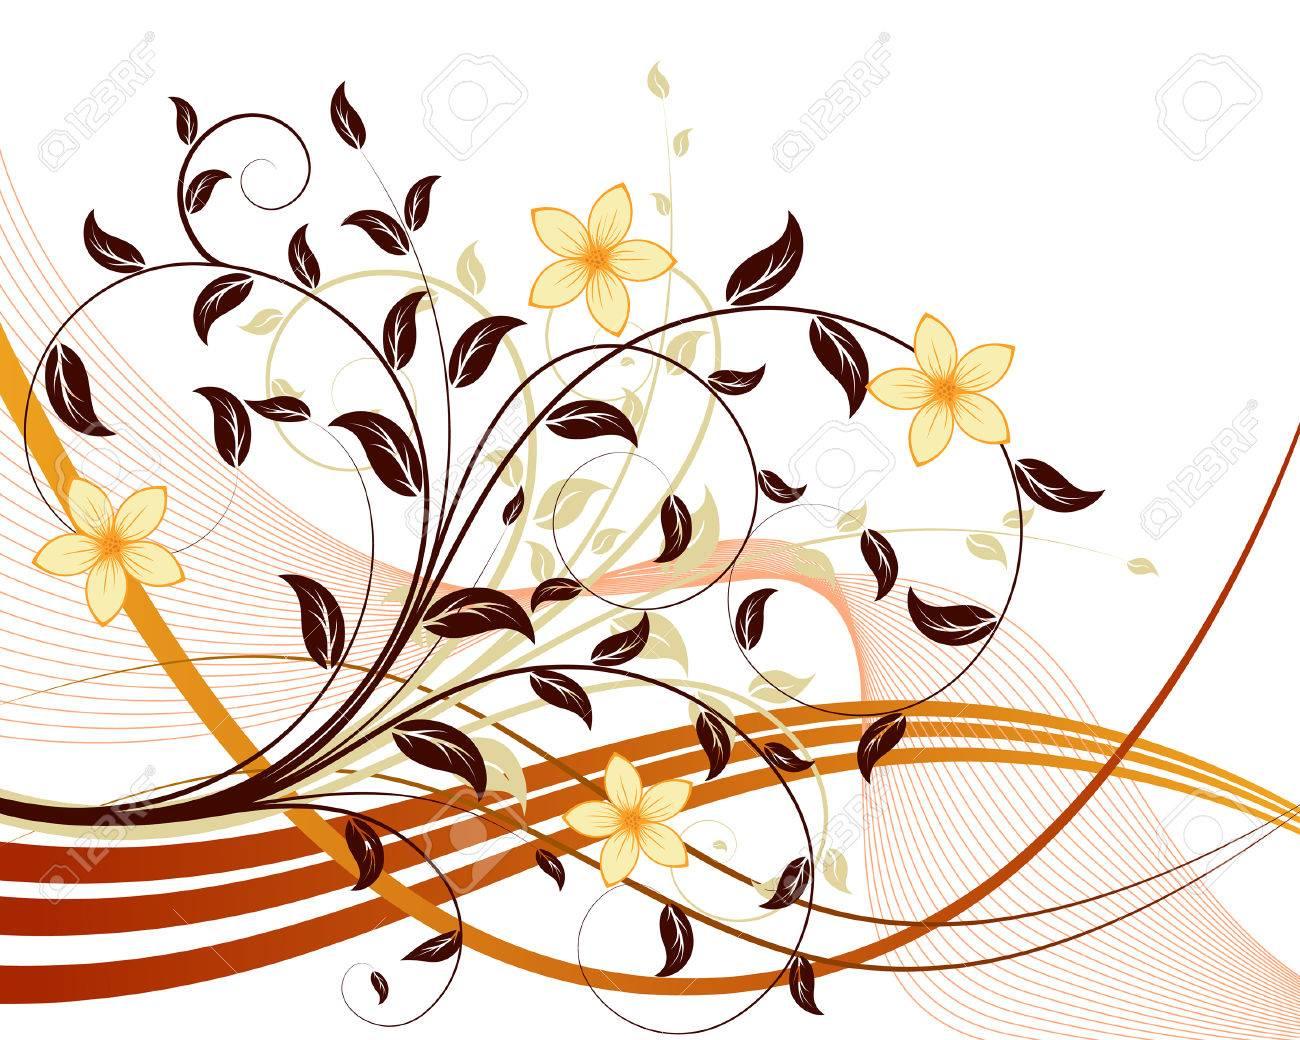 Floral background for design use. Vector illustration. Stock Vector - 5508518